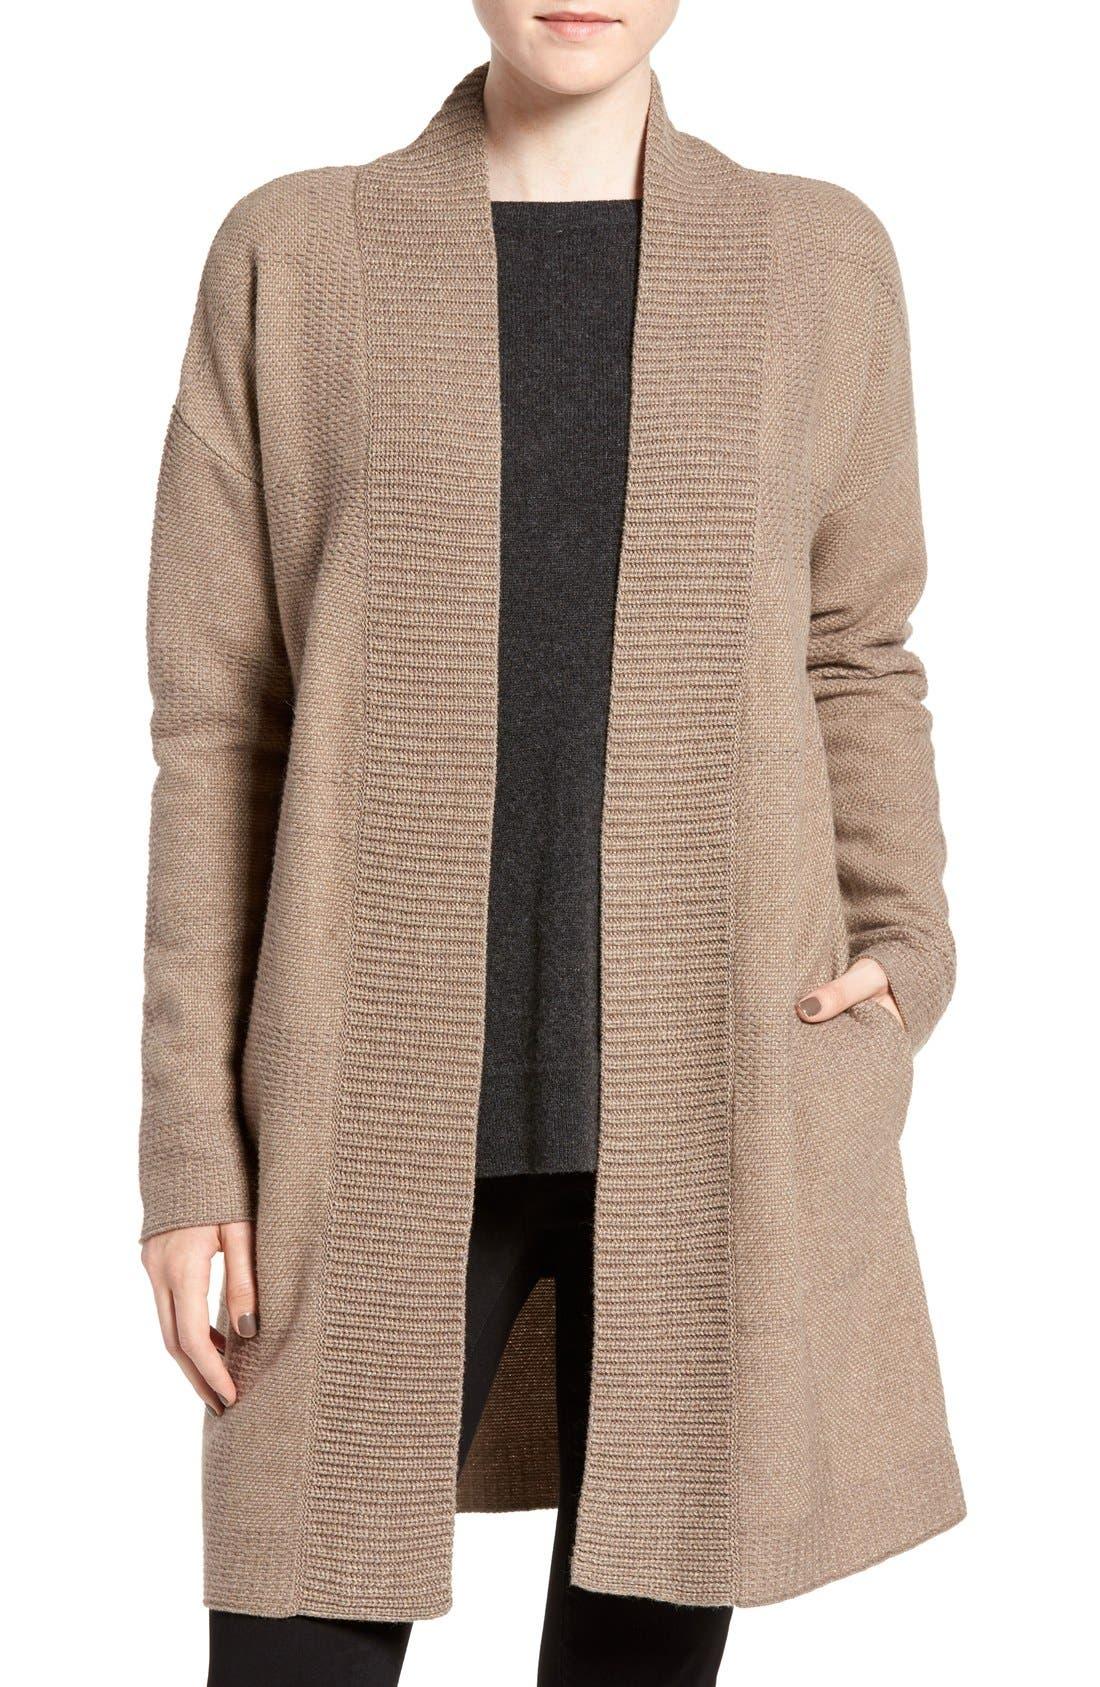 'Tiree' Multi Texture Cardigan, Main, color, 270